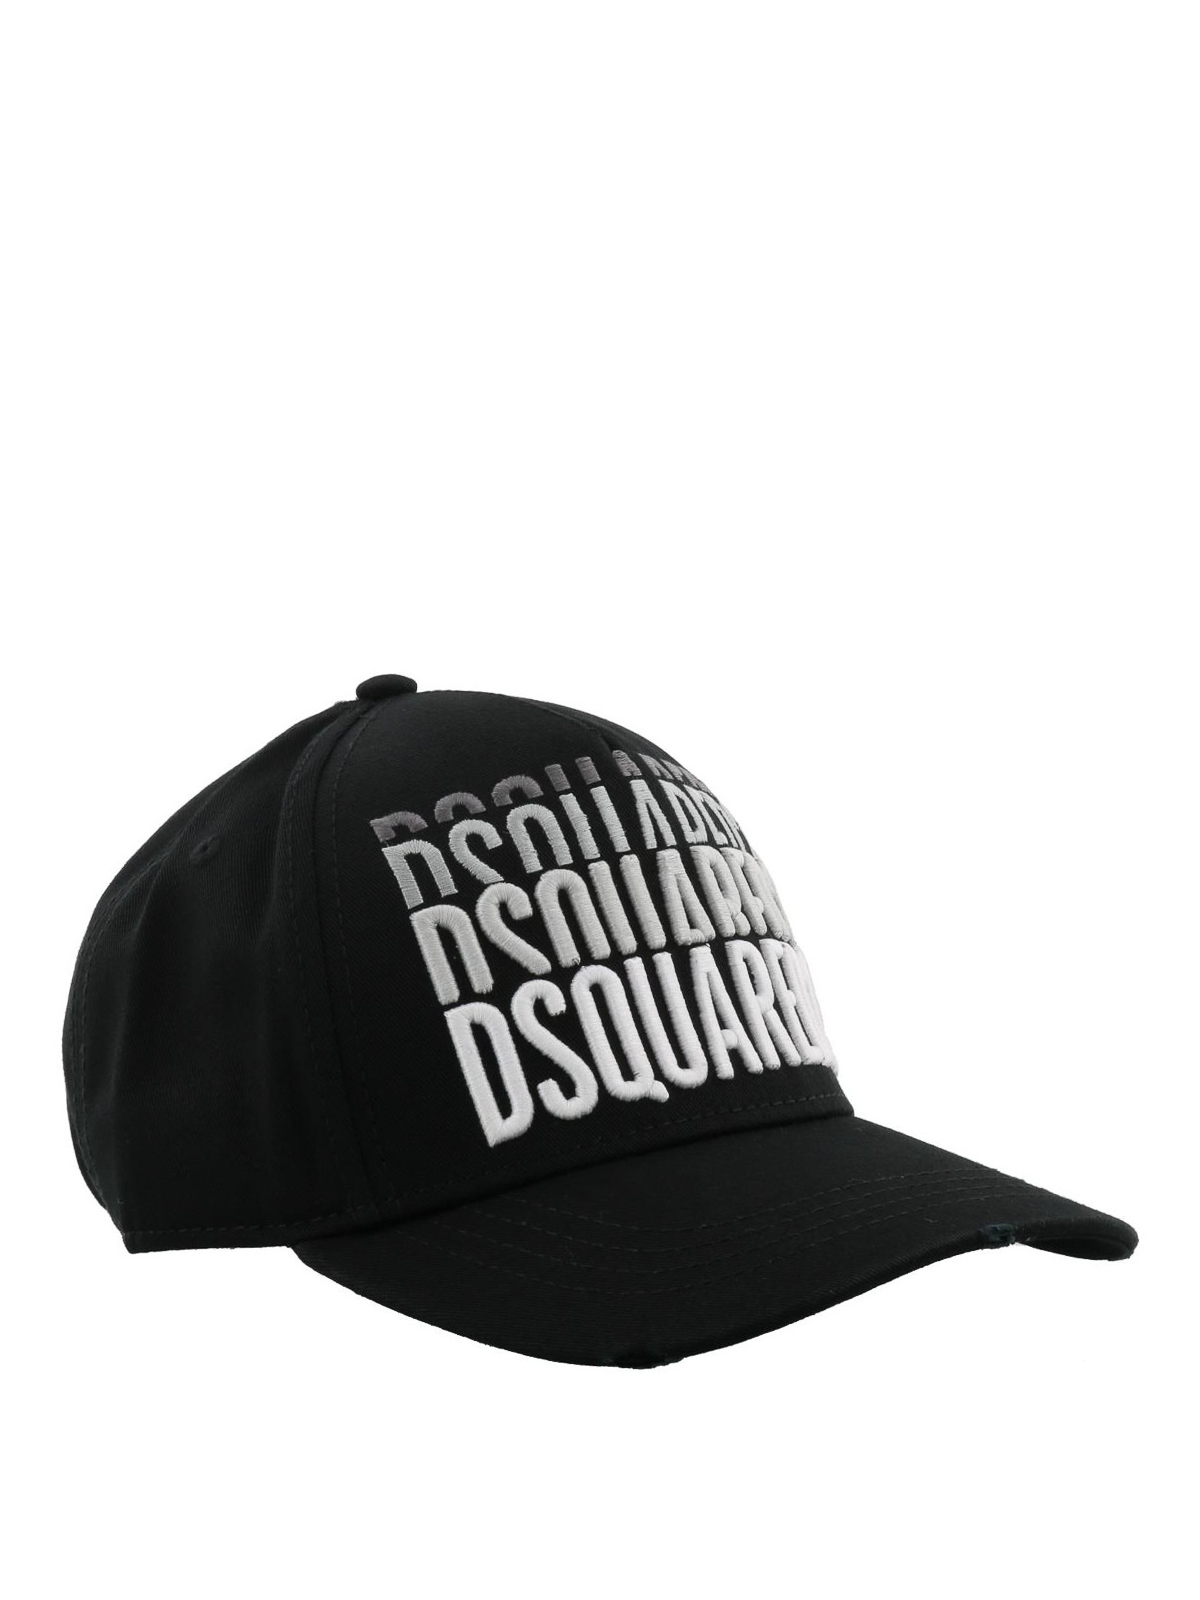 e400030c7 Dsquared2 - Repeated logo cotton baseball cap - hats & caps ...